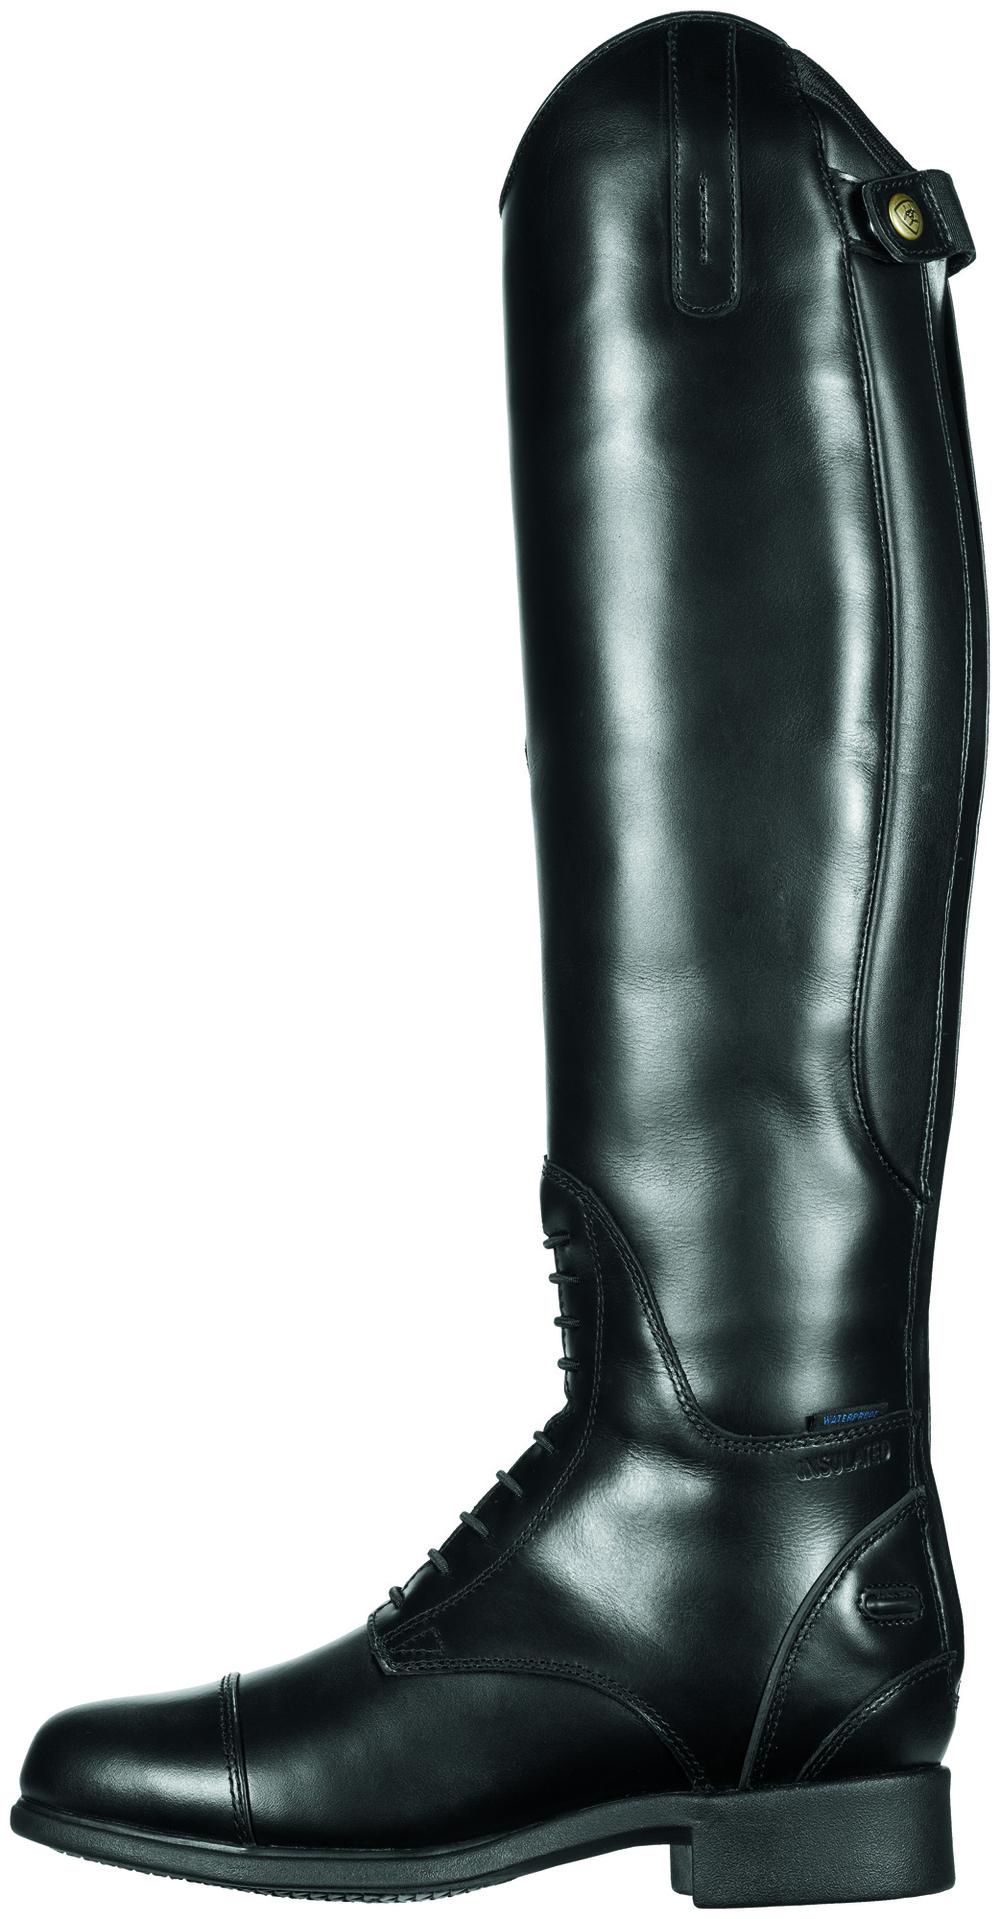 Ariat Bromont Boots